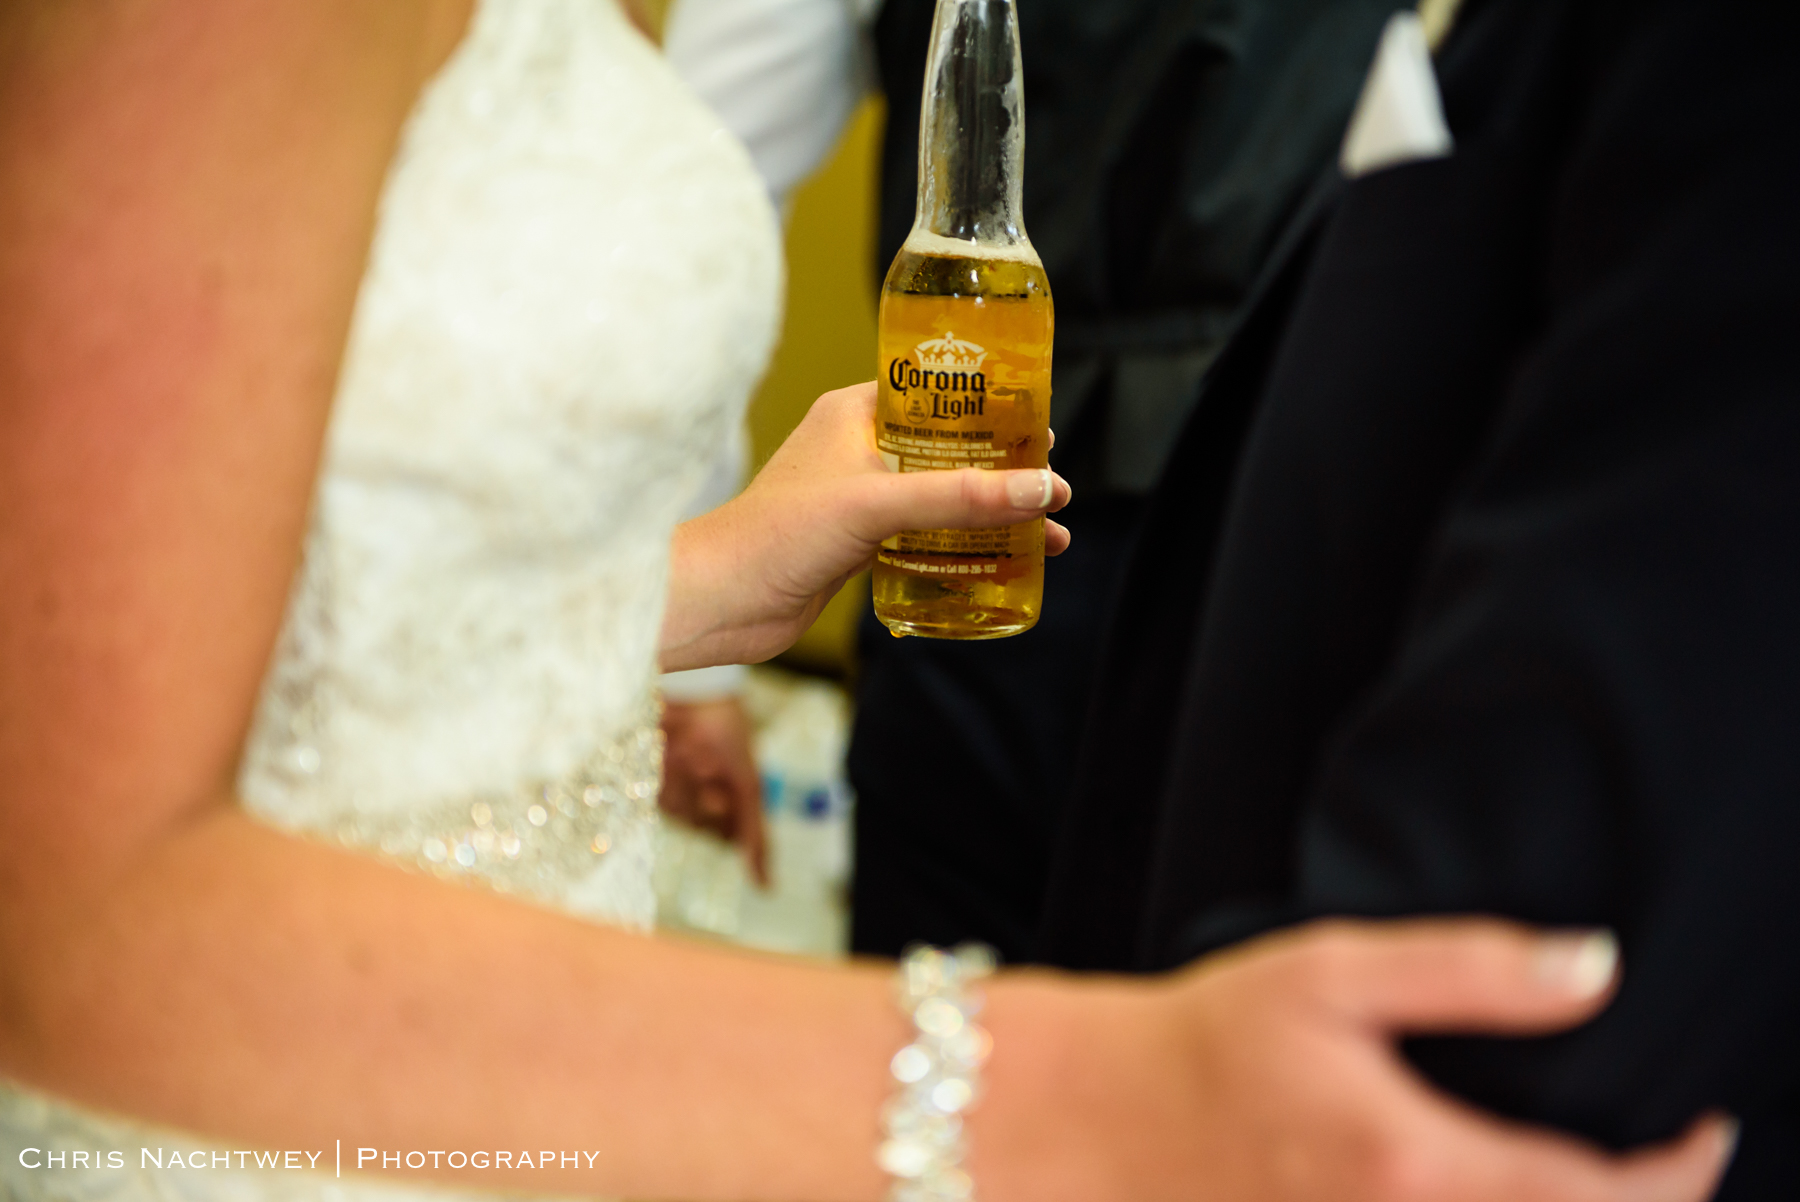 wedding-lake-of-isles-photos-chris-nachtwey-photography-2019-20.jpg